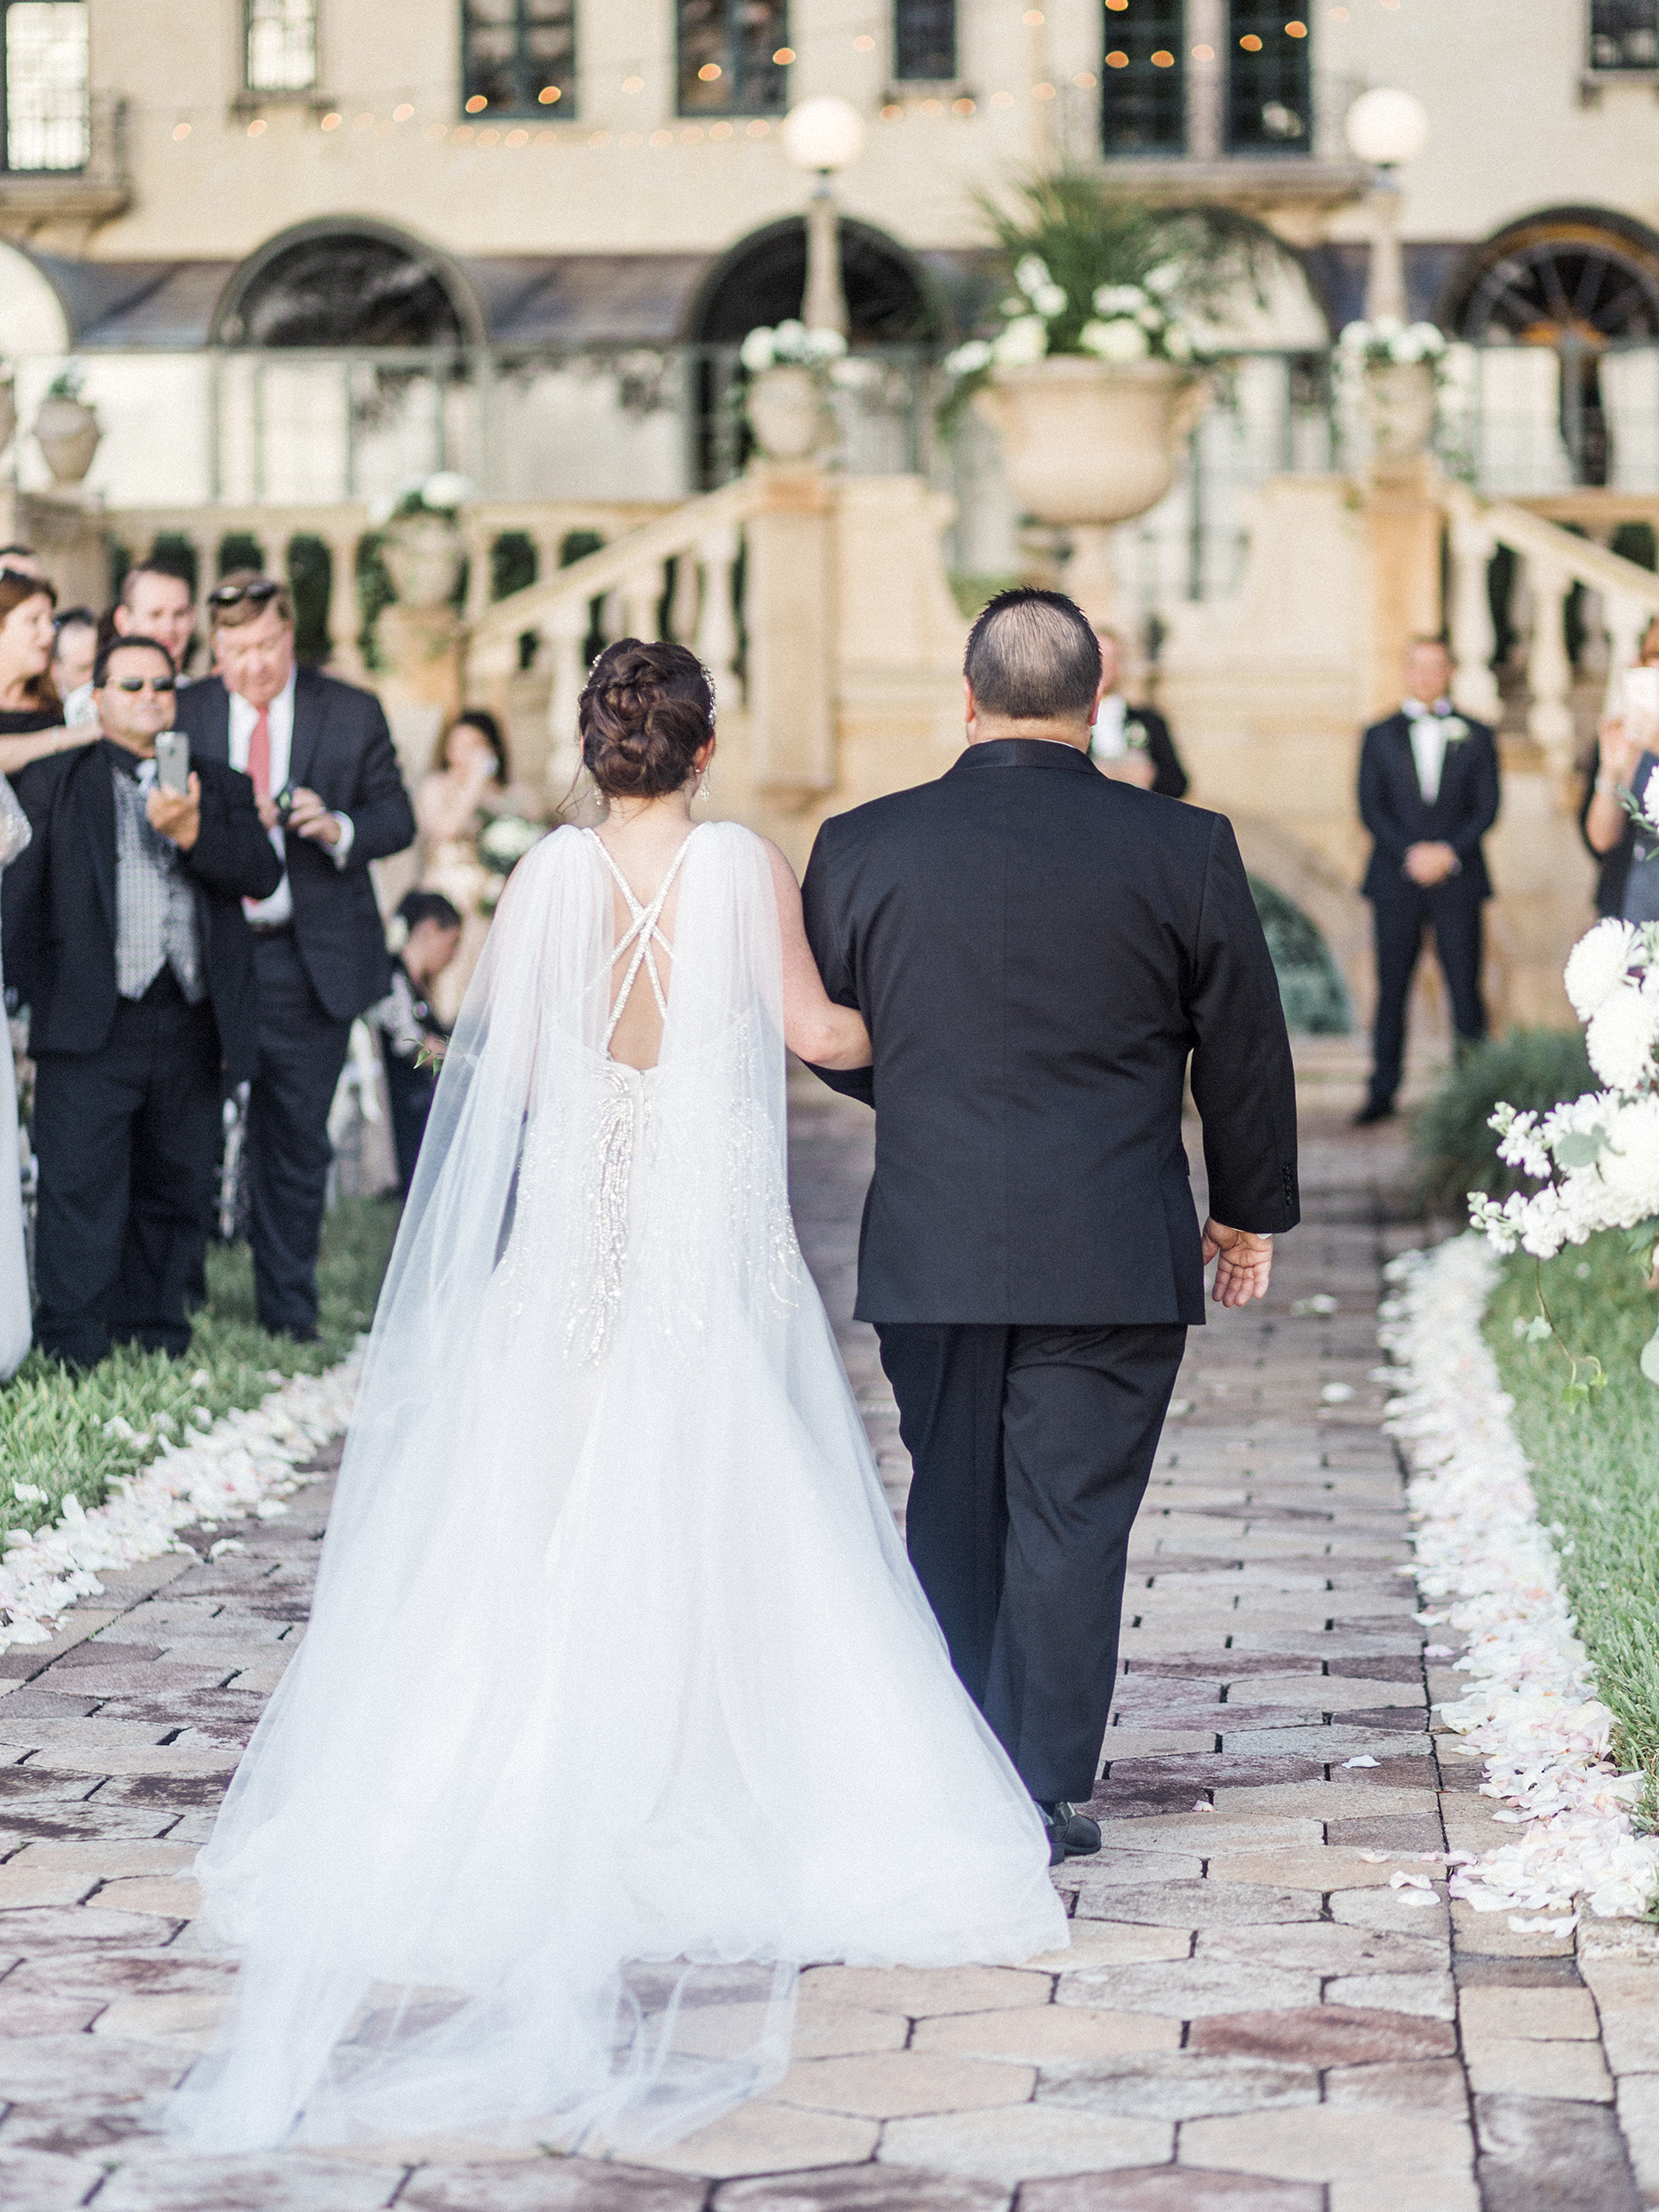 Lisa Silva Photography- Jacksonville, Florida Fine Art Film Wedding Photography Epping Forrest Yacht Club 39.jpg